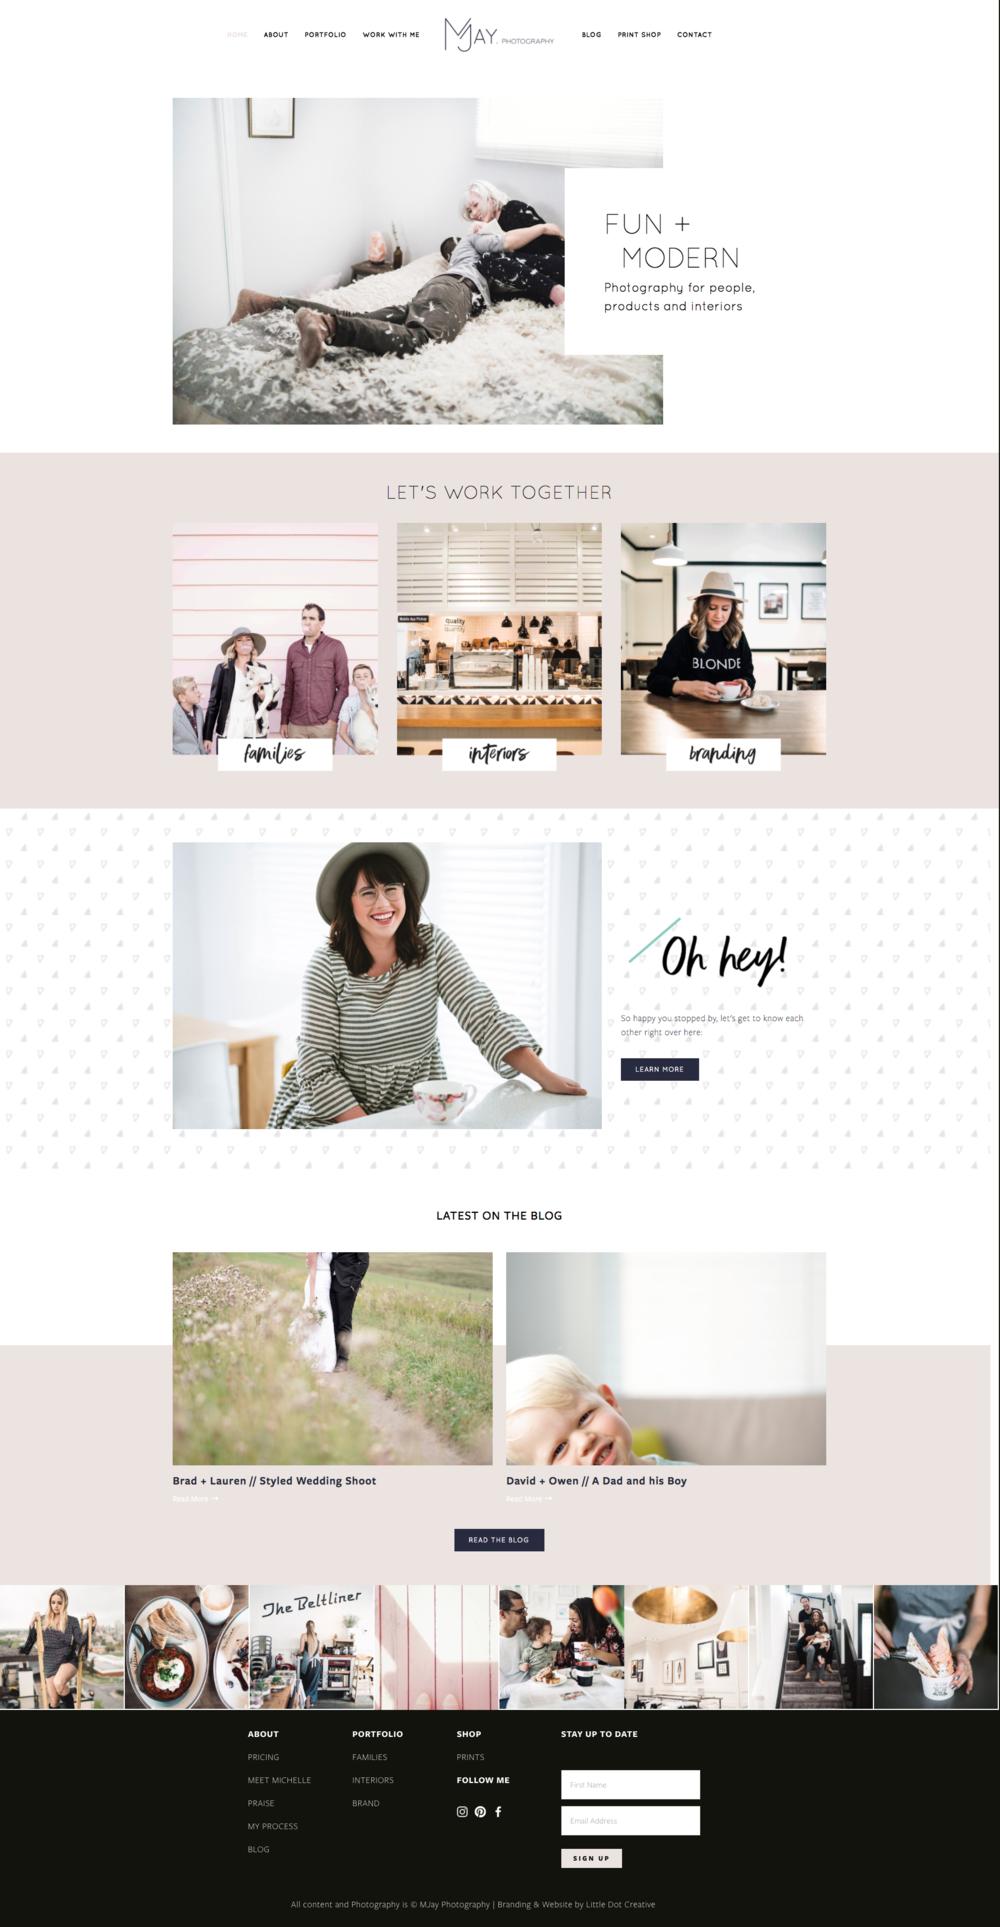 MJay Photography Branding + Website Design on Little Dot Creative